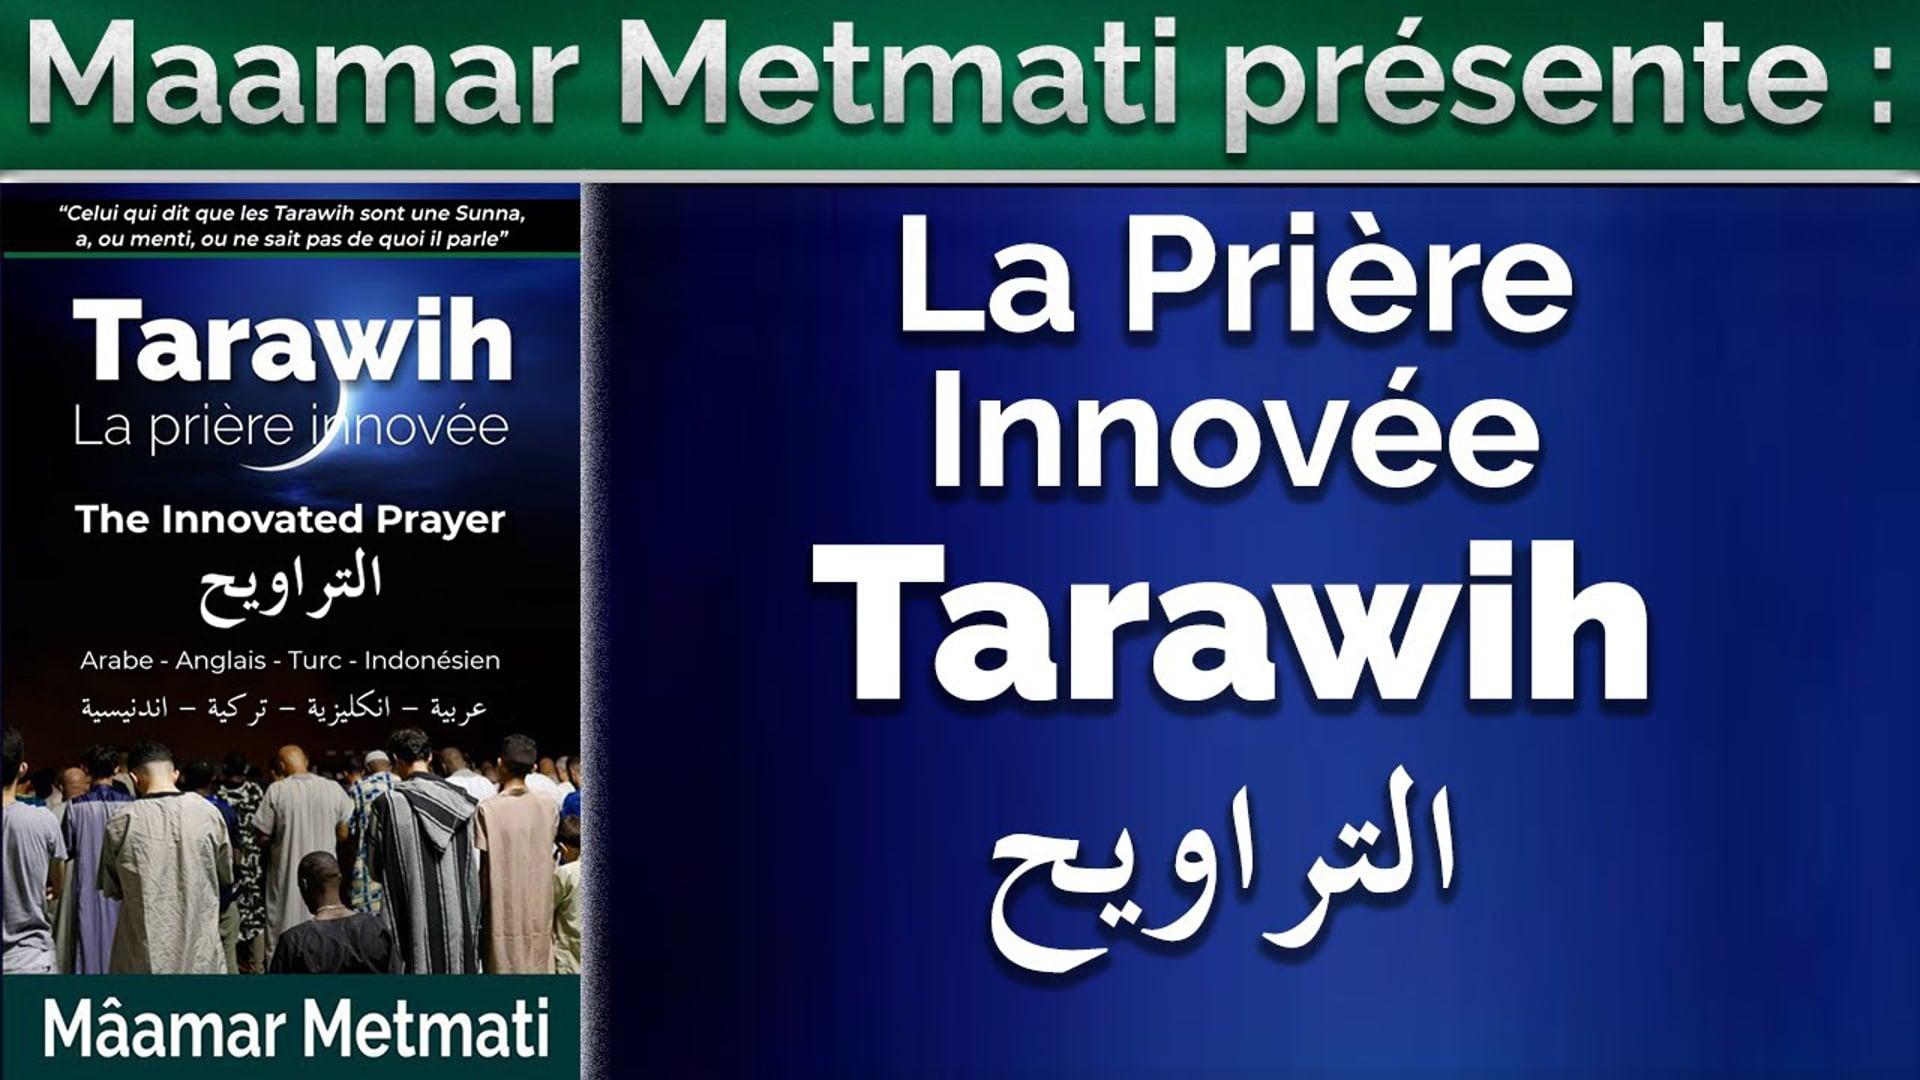 La prière innovée Tarawih  التراويح : Arabe-Français-Turc-Anglais-Indonésien